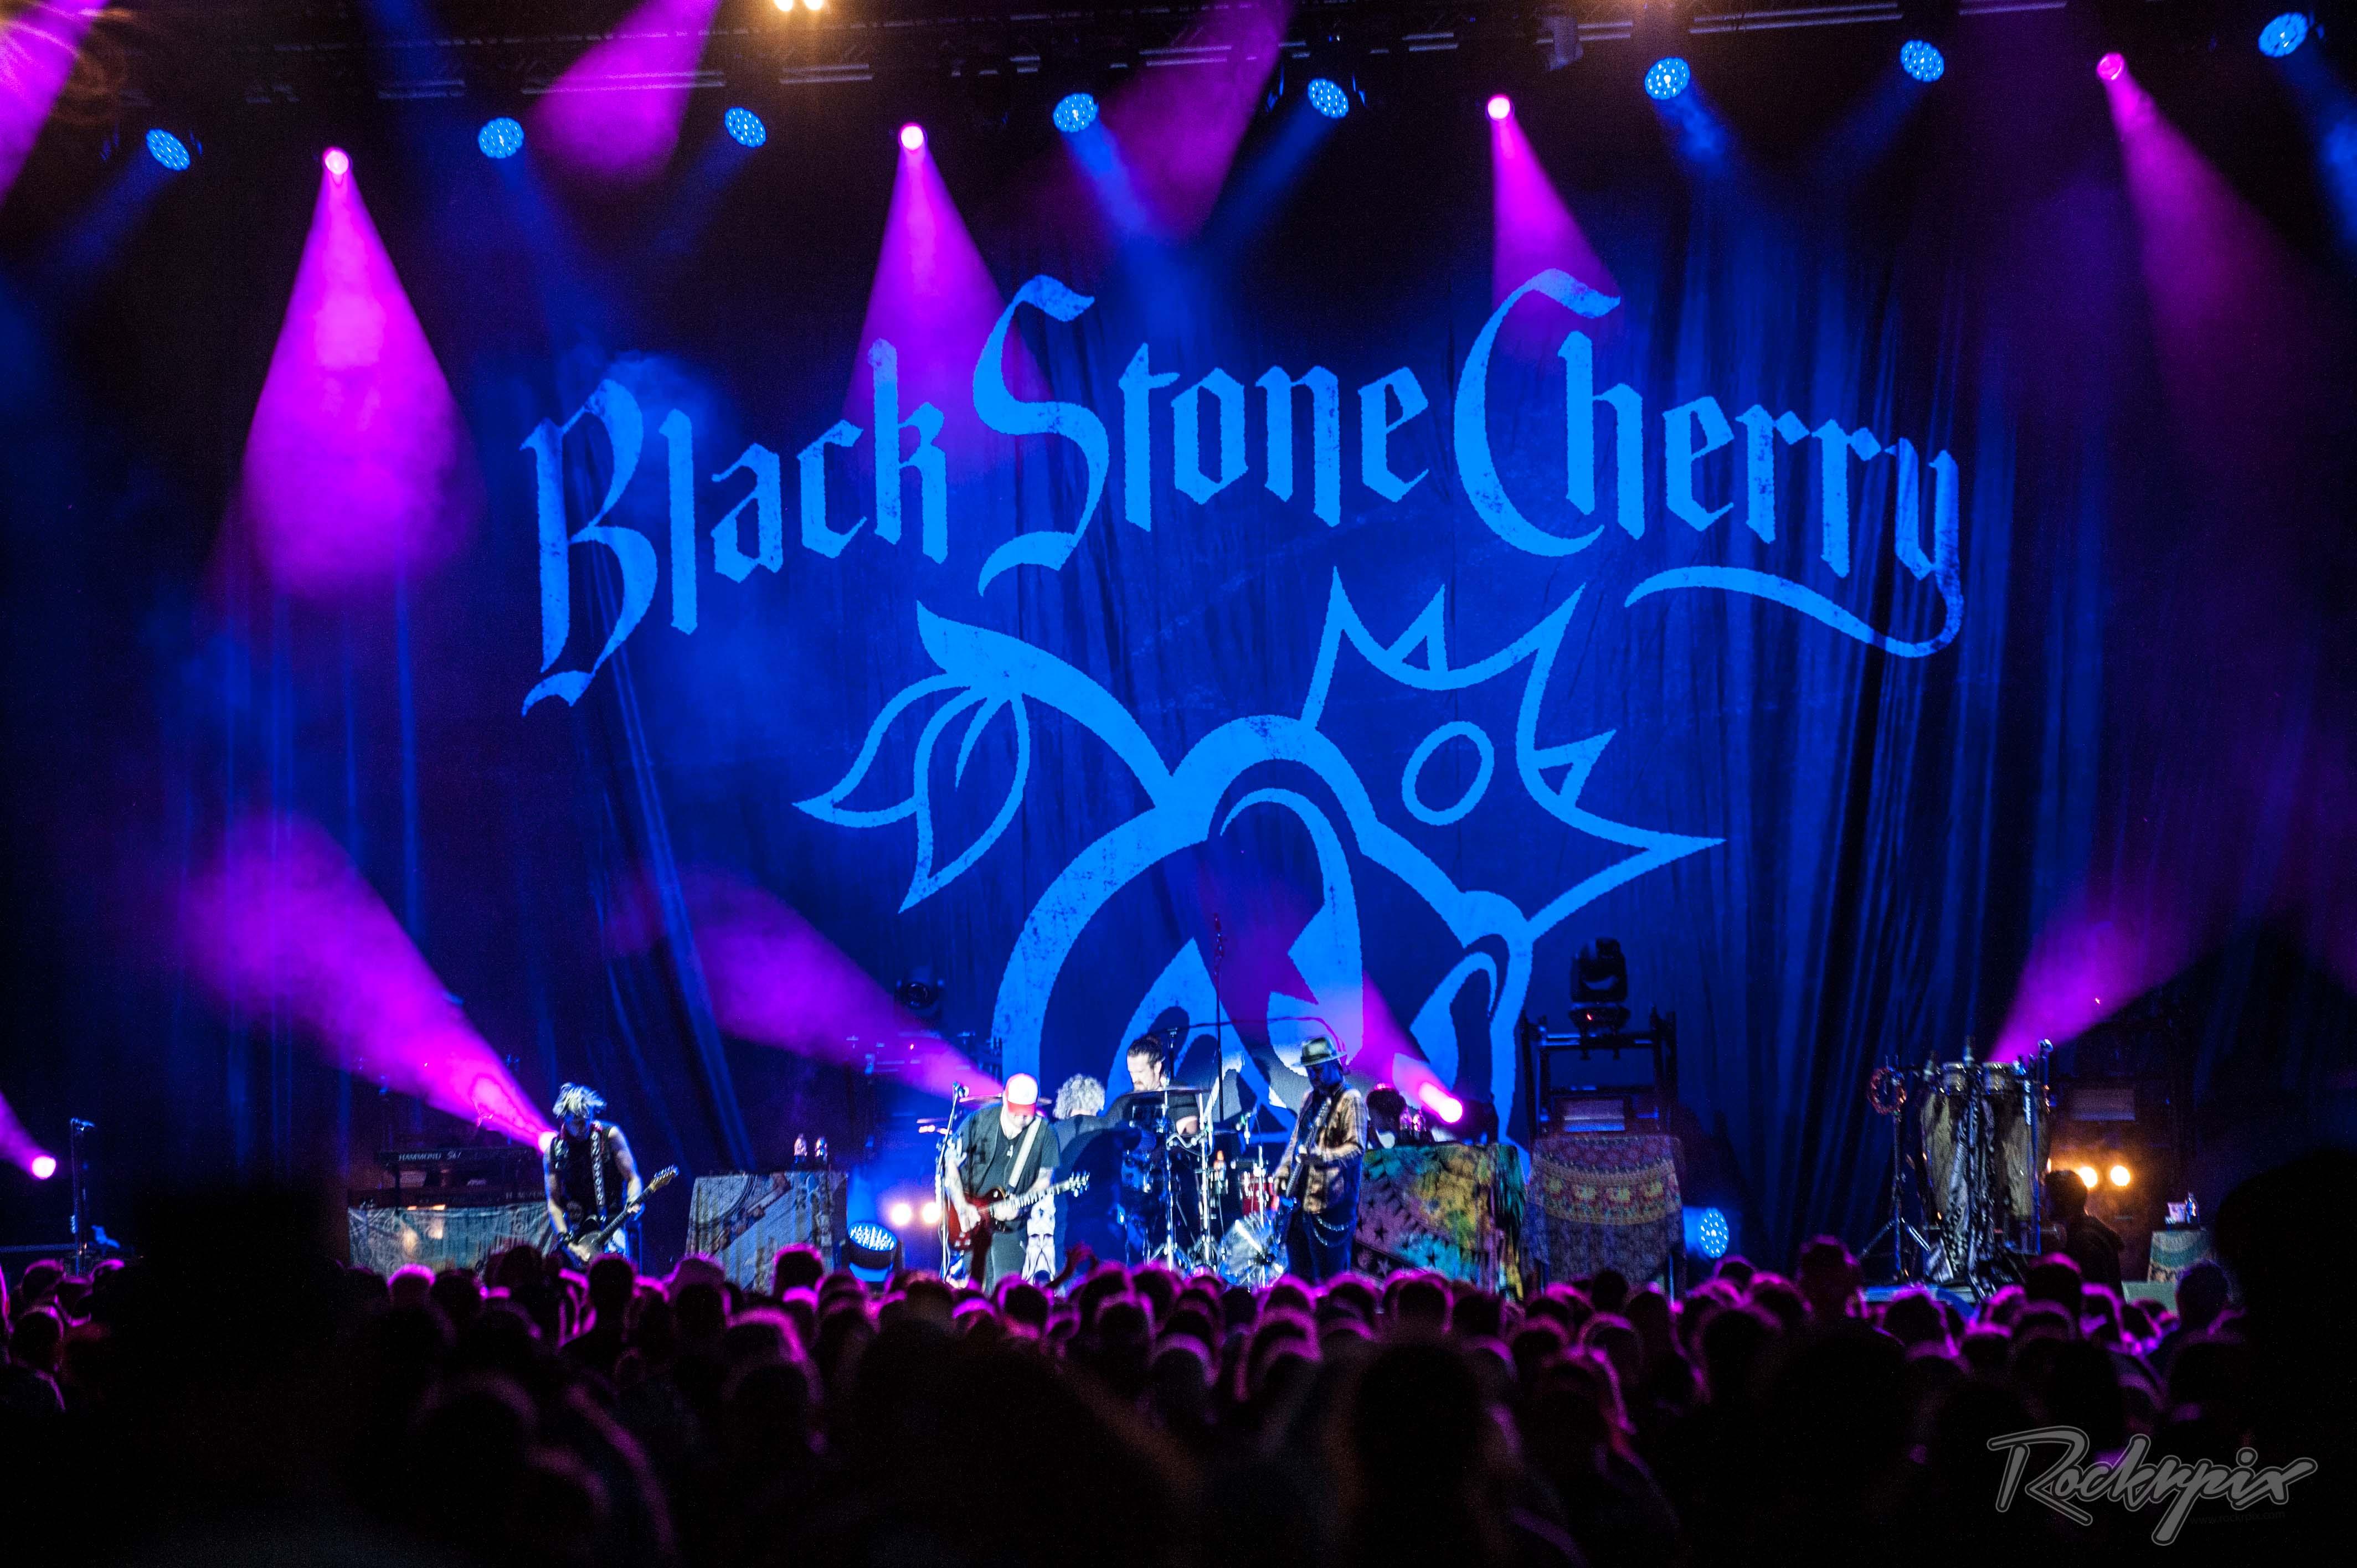 BlackStoneCherry-7809.jpg